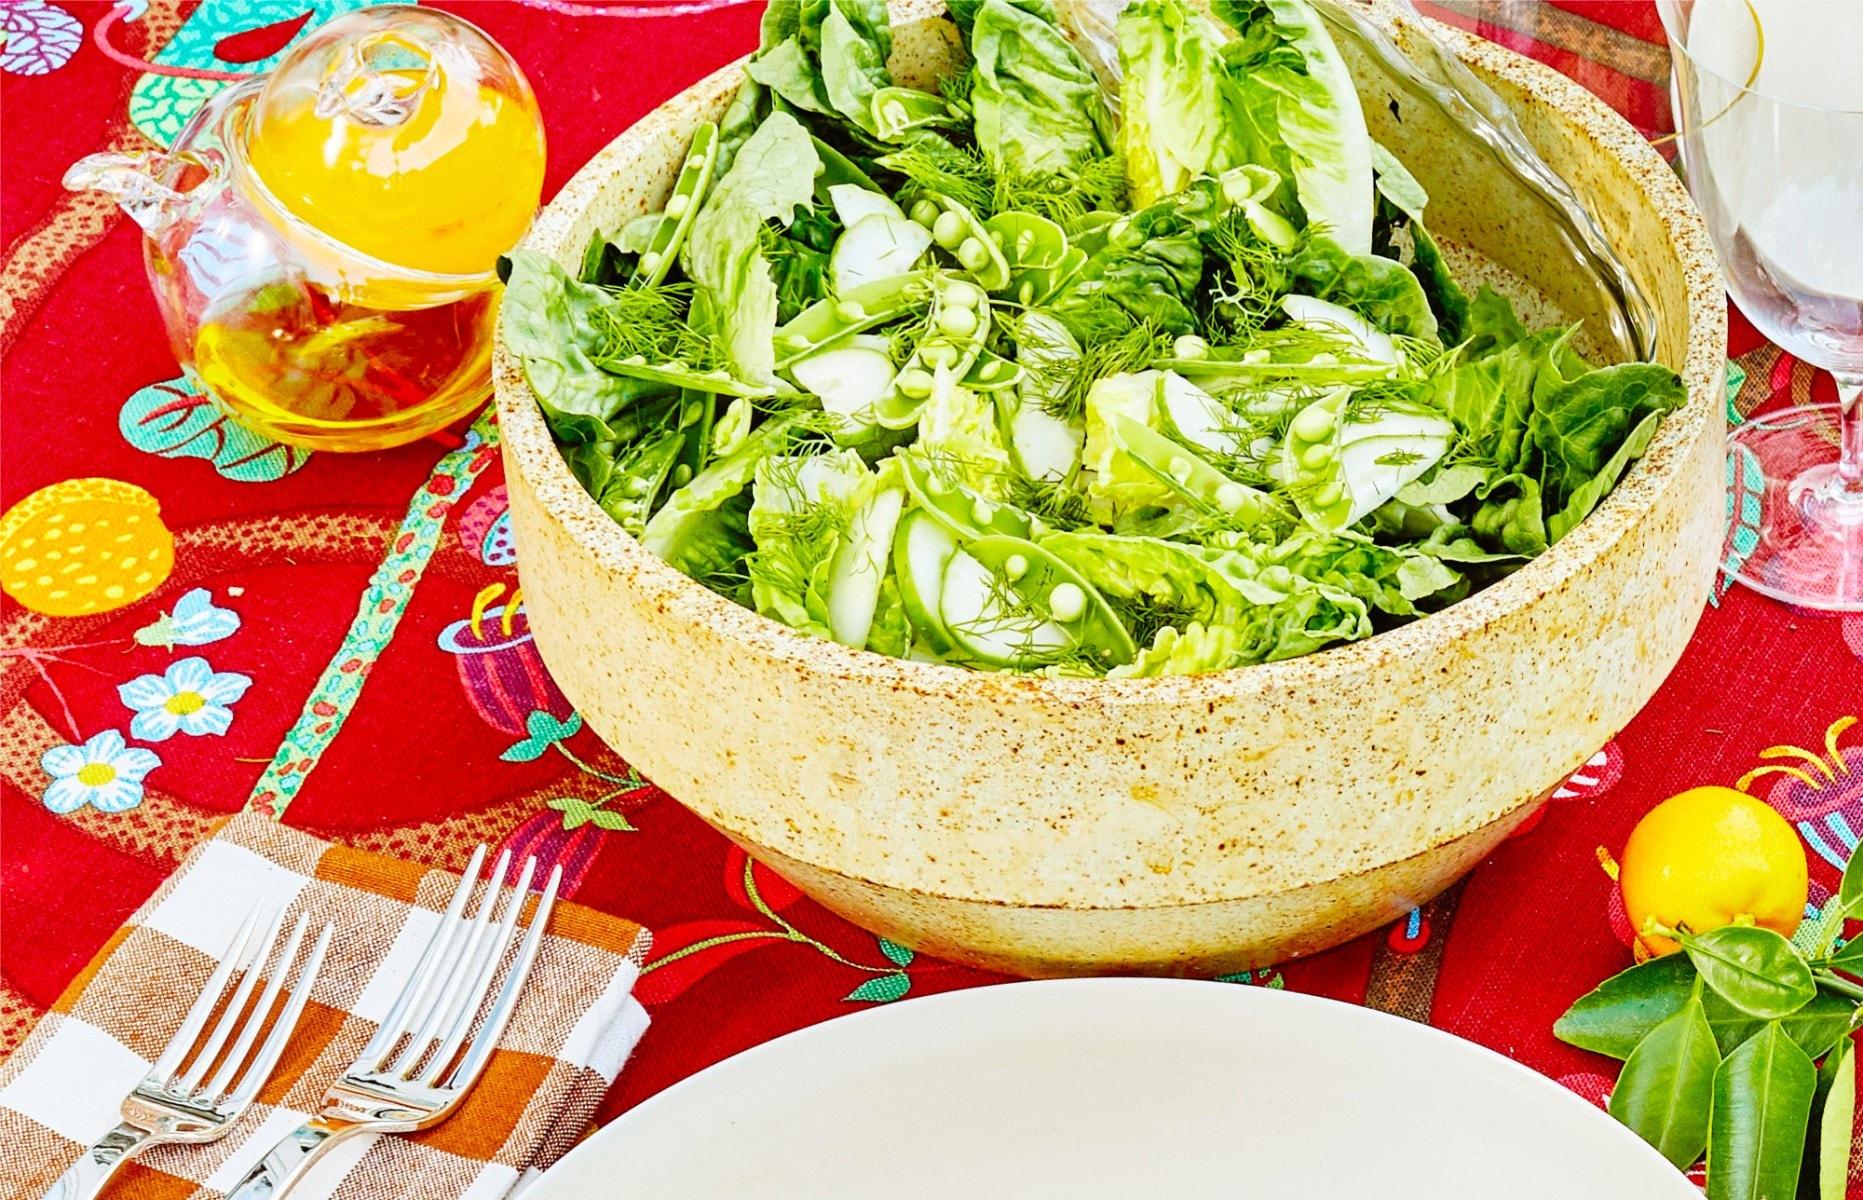 LAURENCE BRABANT Oil and Vinegar Inseparables – CICA GOMEZ Ceramic Bowl